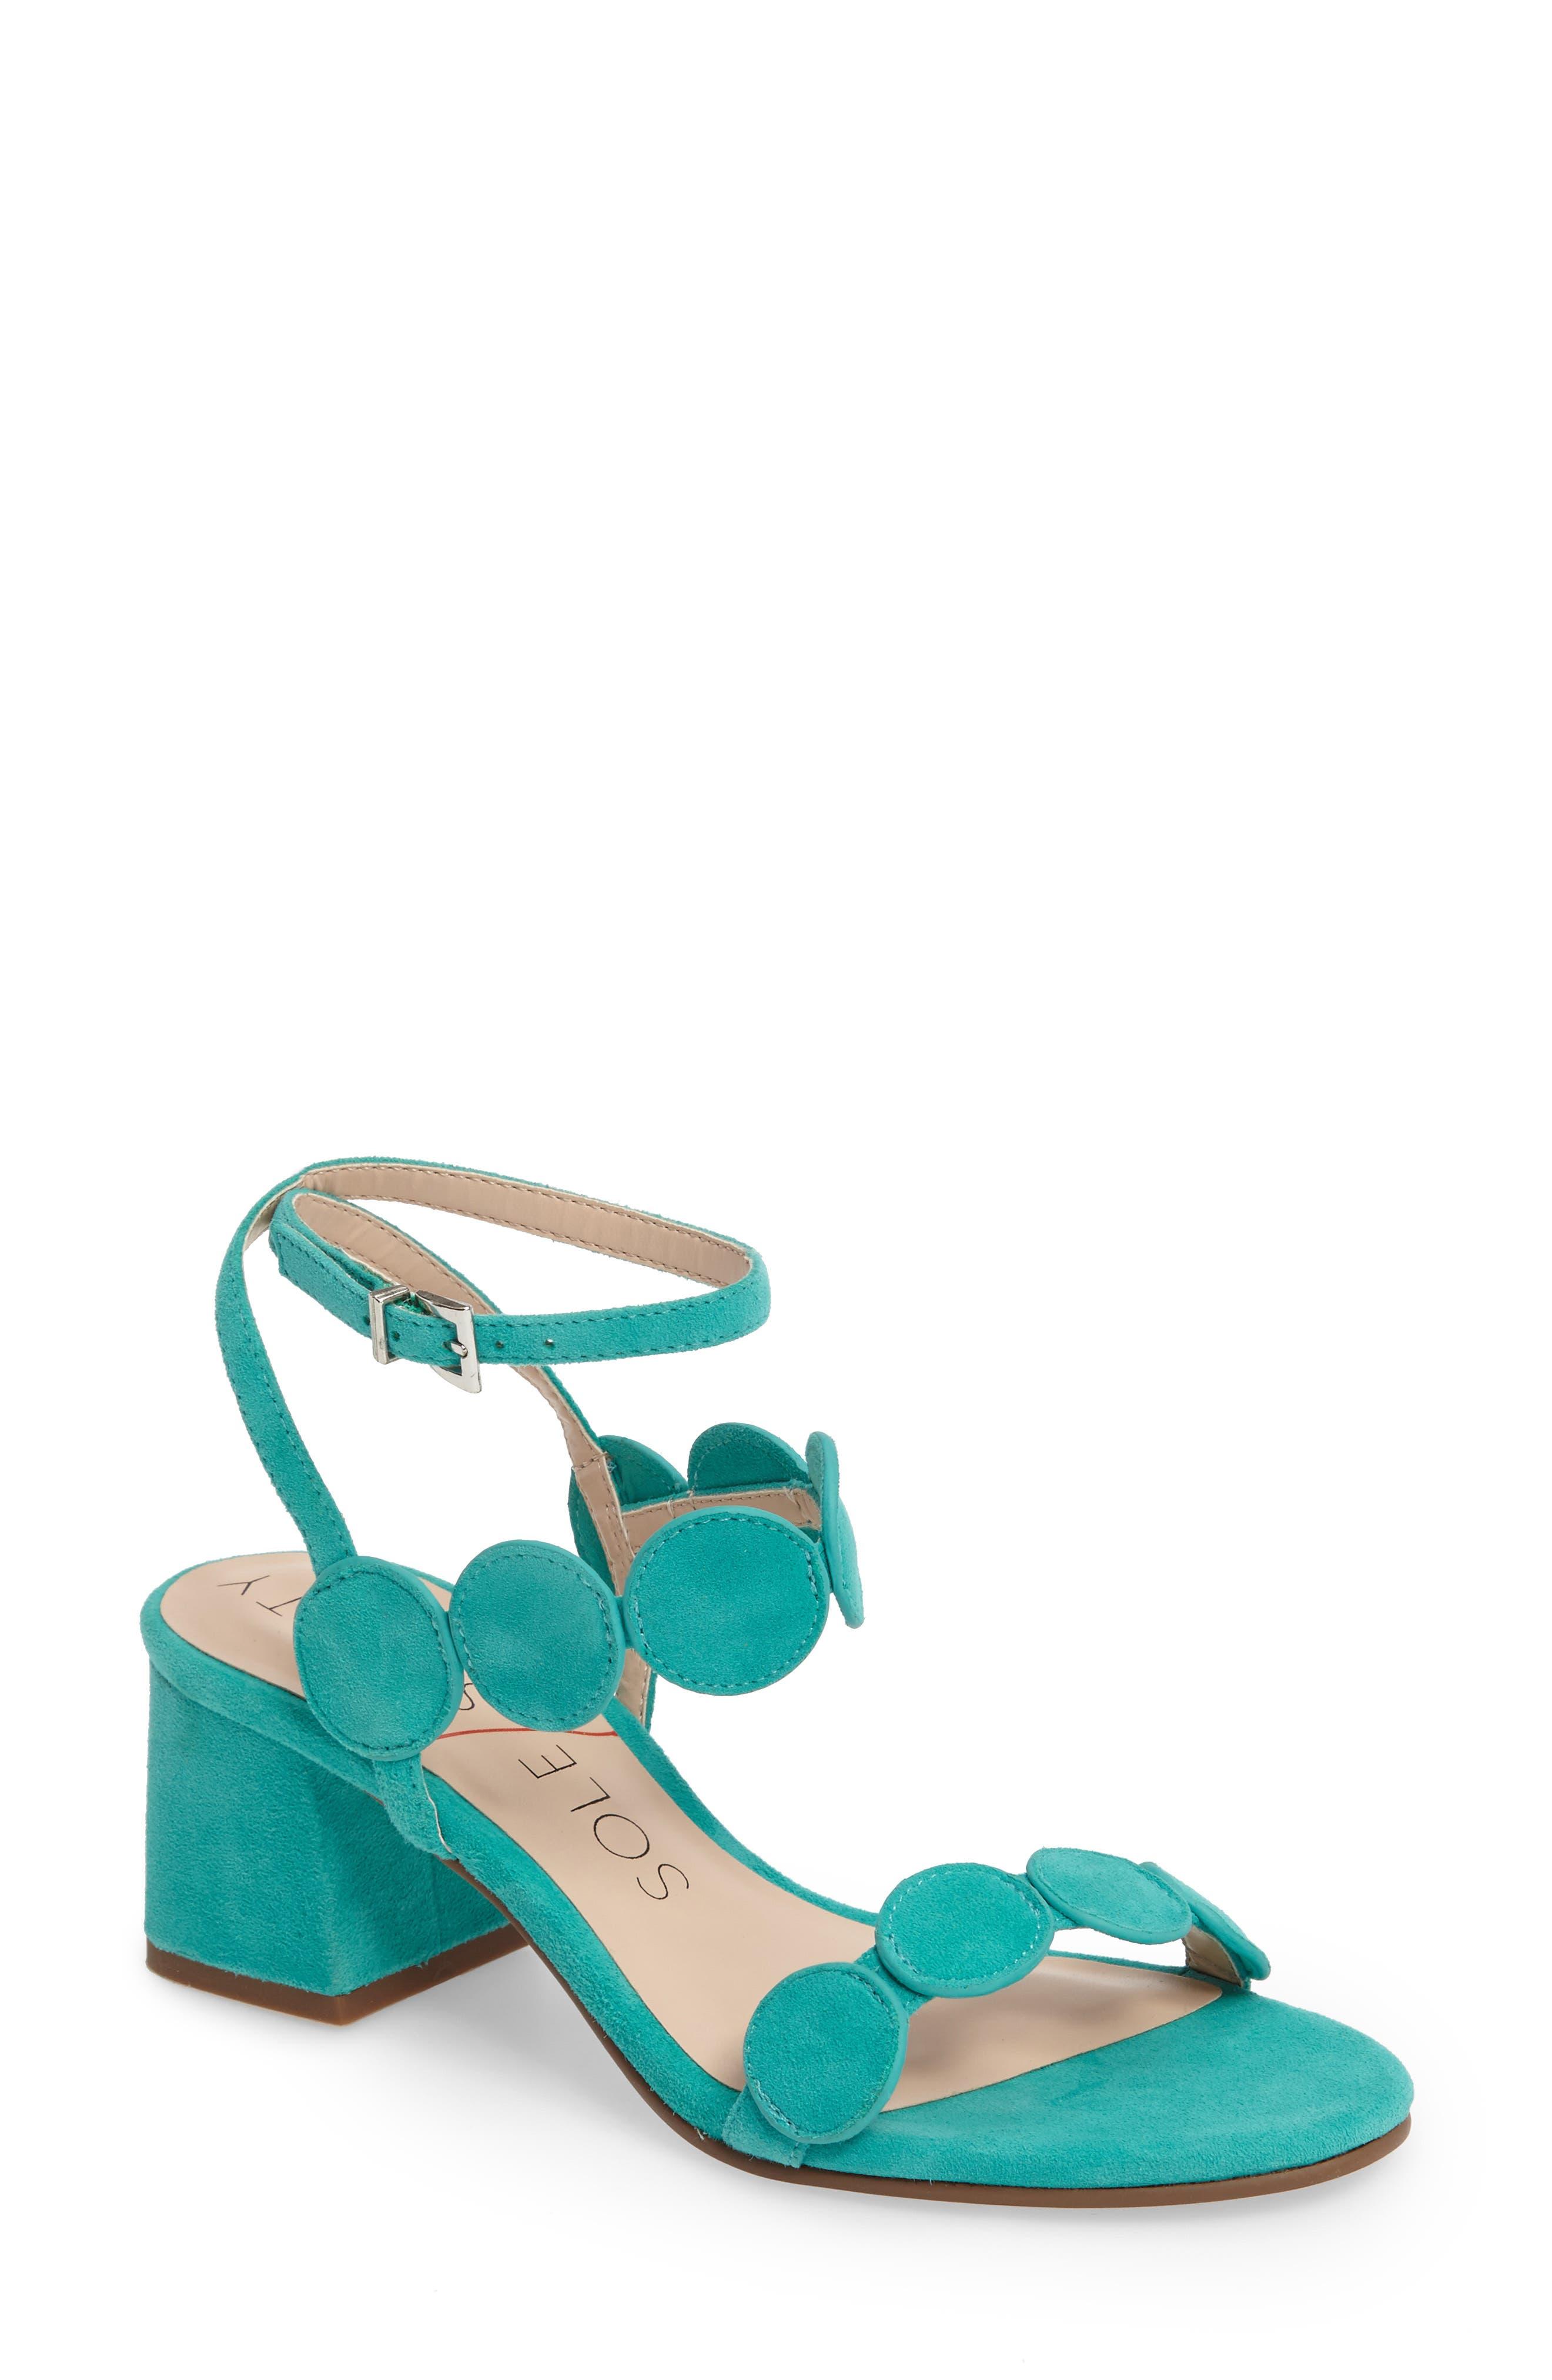 Shea Block Heel Sandal,                             Main thumbnail 5, color,